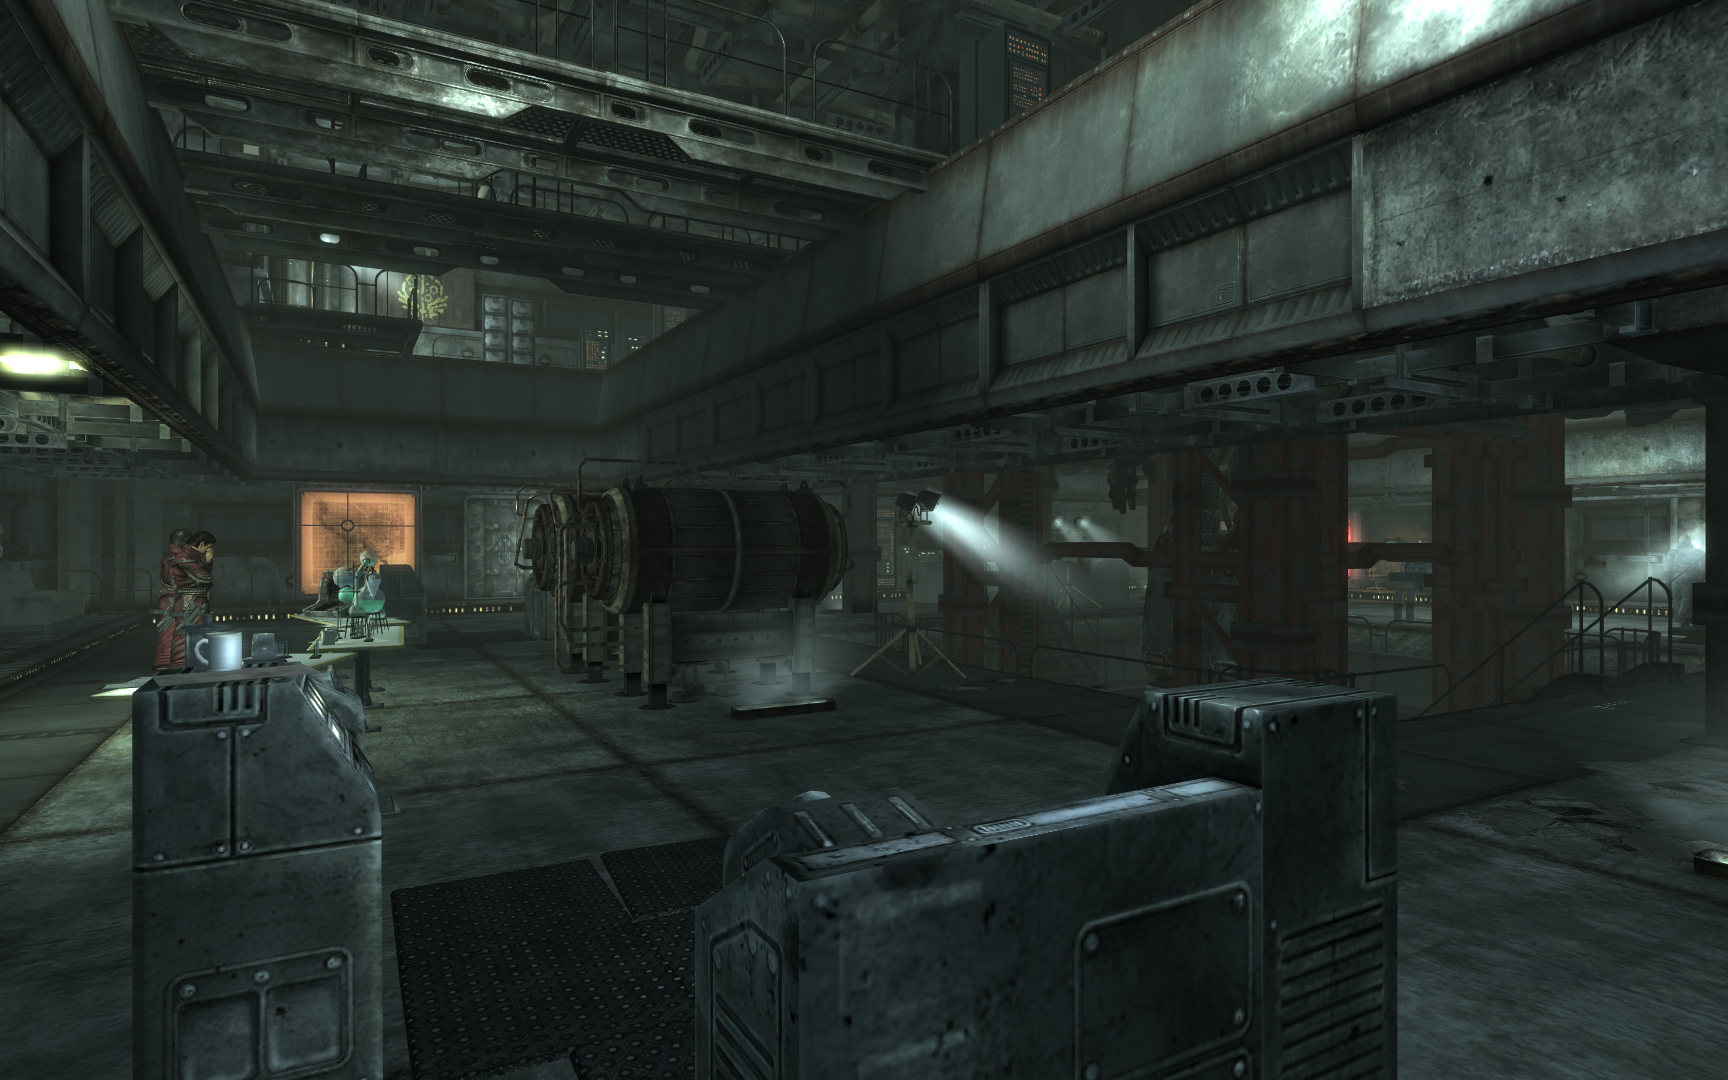 Citadel Laboratory Fallout Wiki Fandom Powered By Wikia